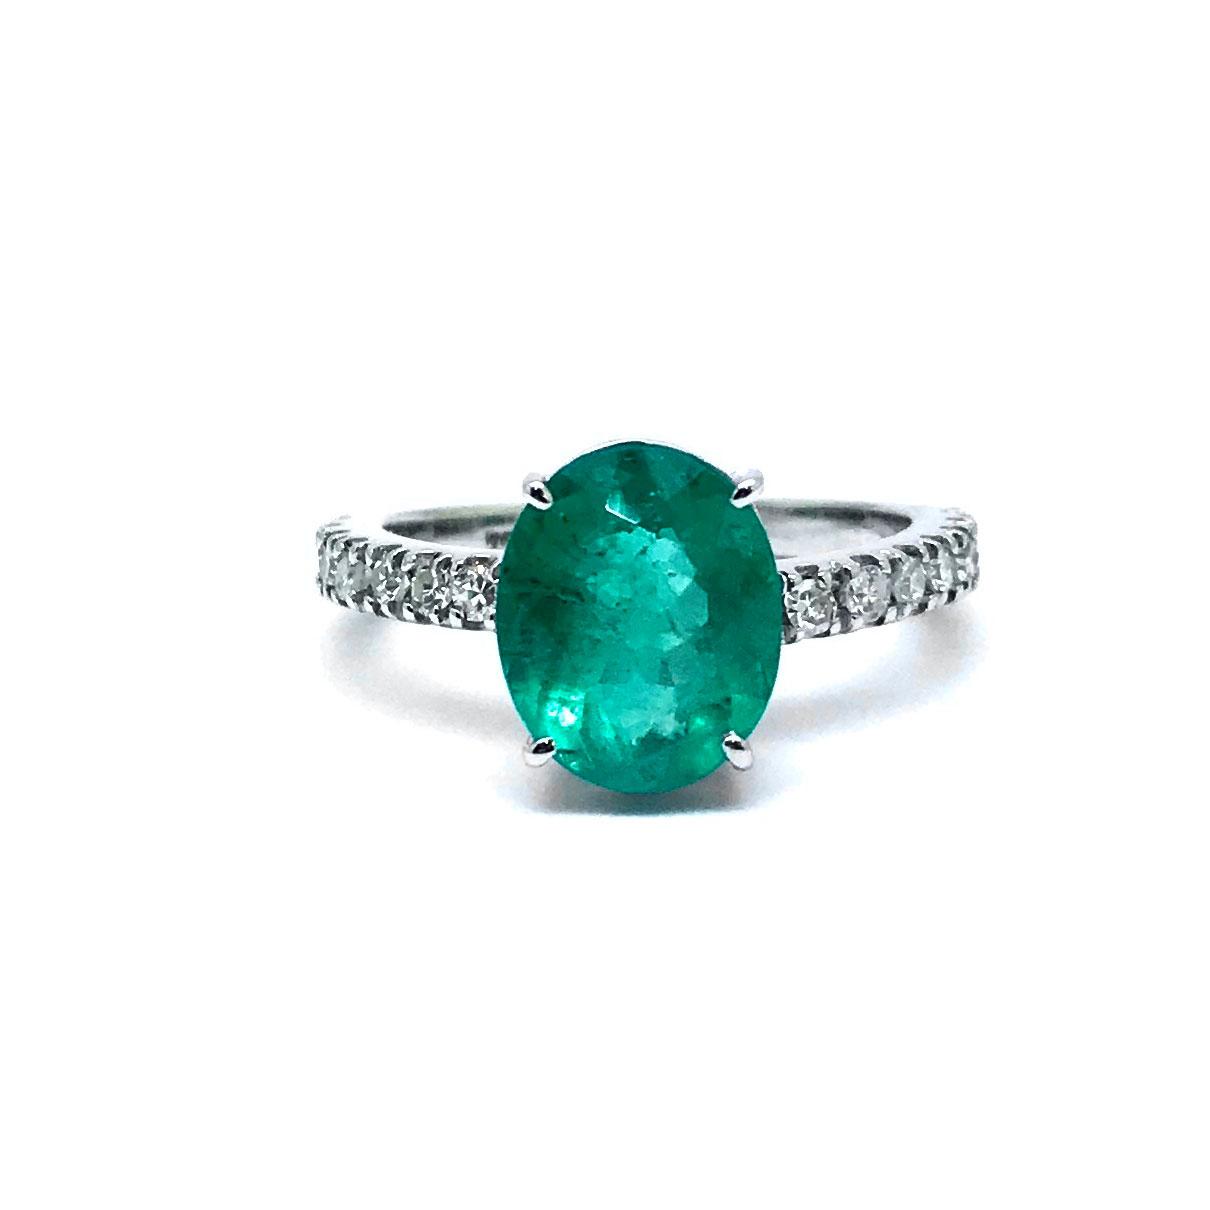 Anel Esmeralda e Diamantes Naturais 2,36Cts Ouro Branco 18K 24505 K1450